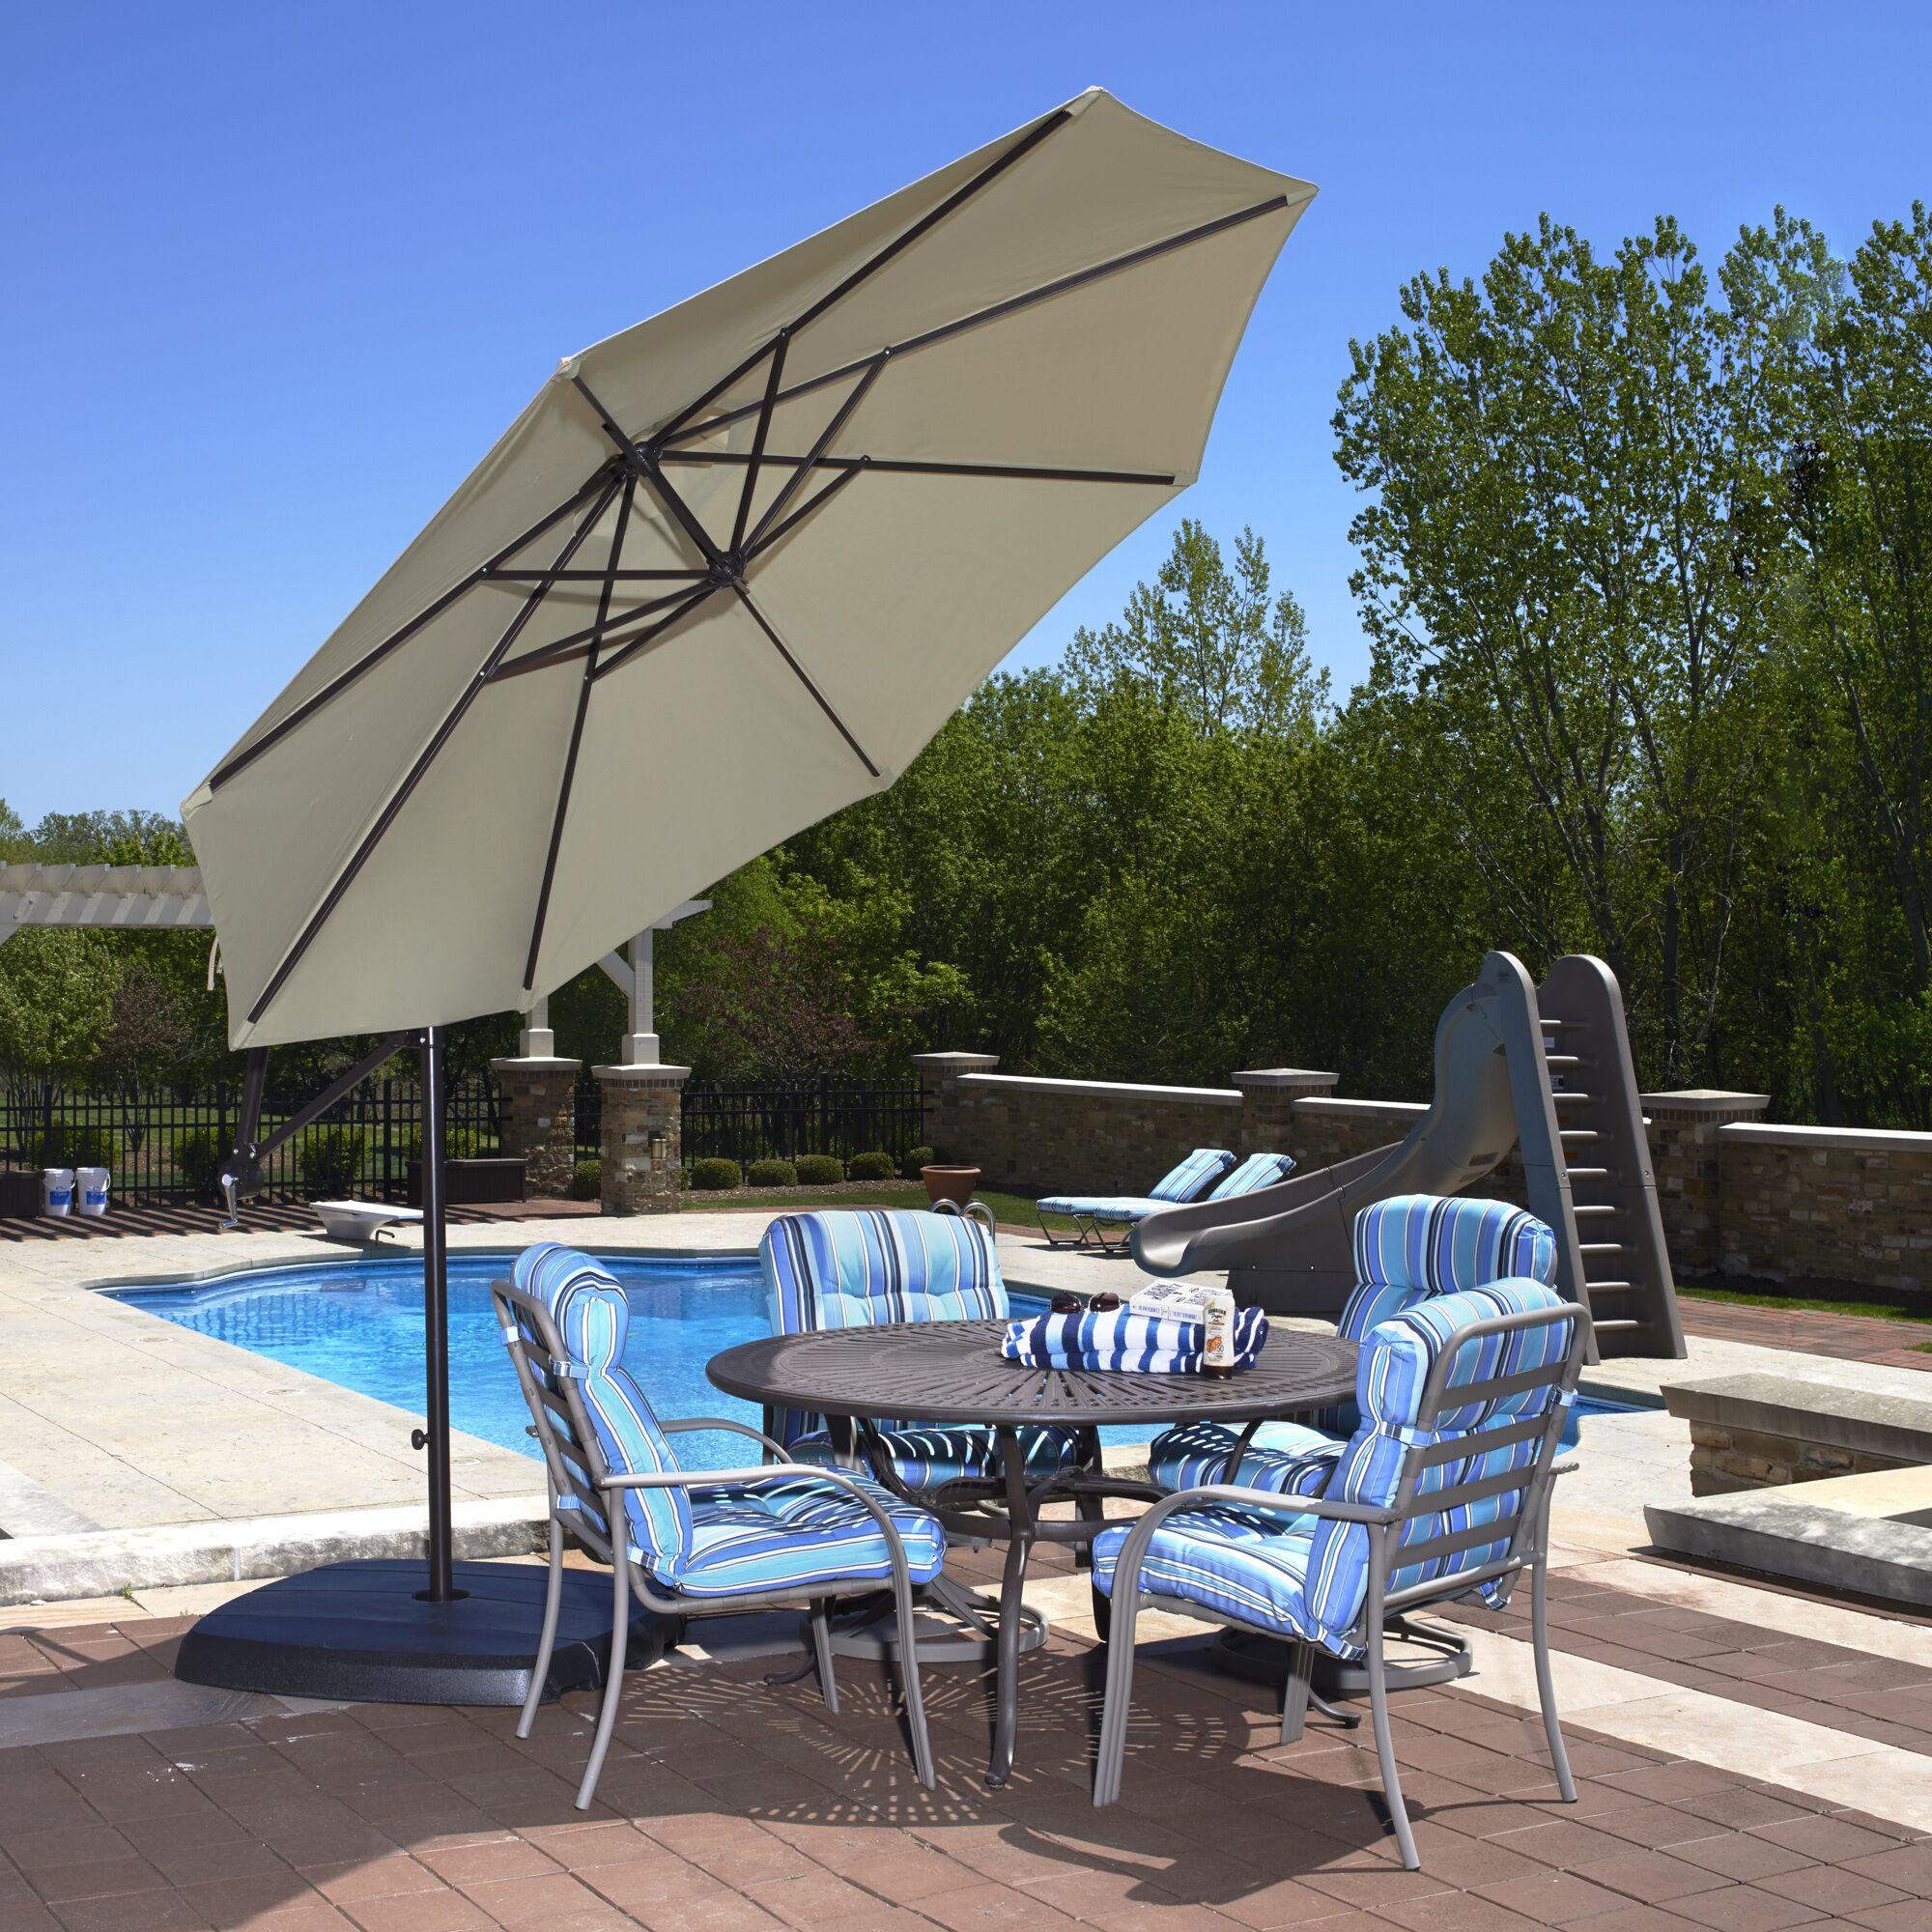 Santiago 10' Cantilever Sunbrella Umbrella Fabric: Beige Sunbrella